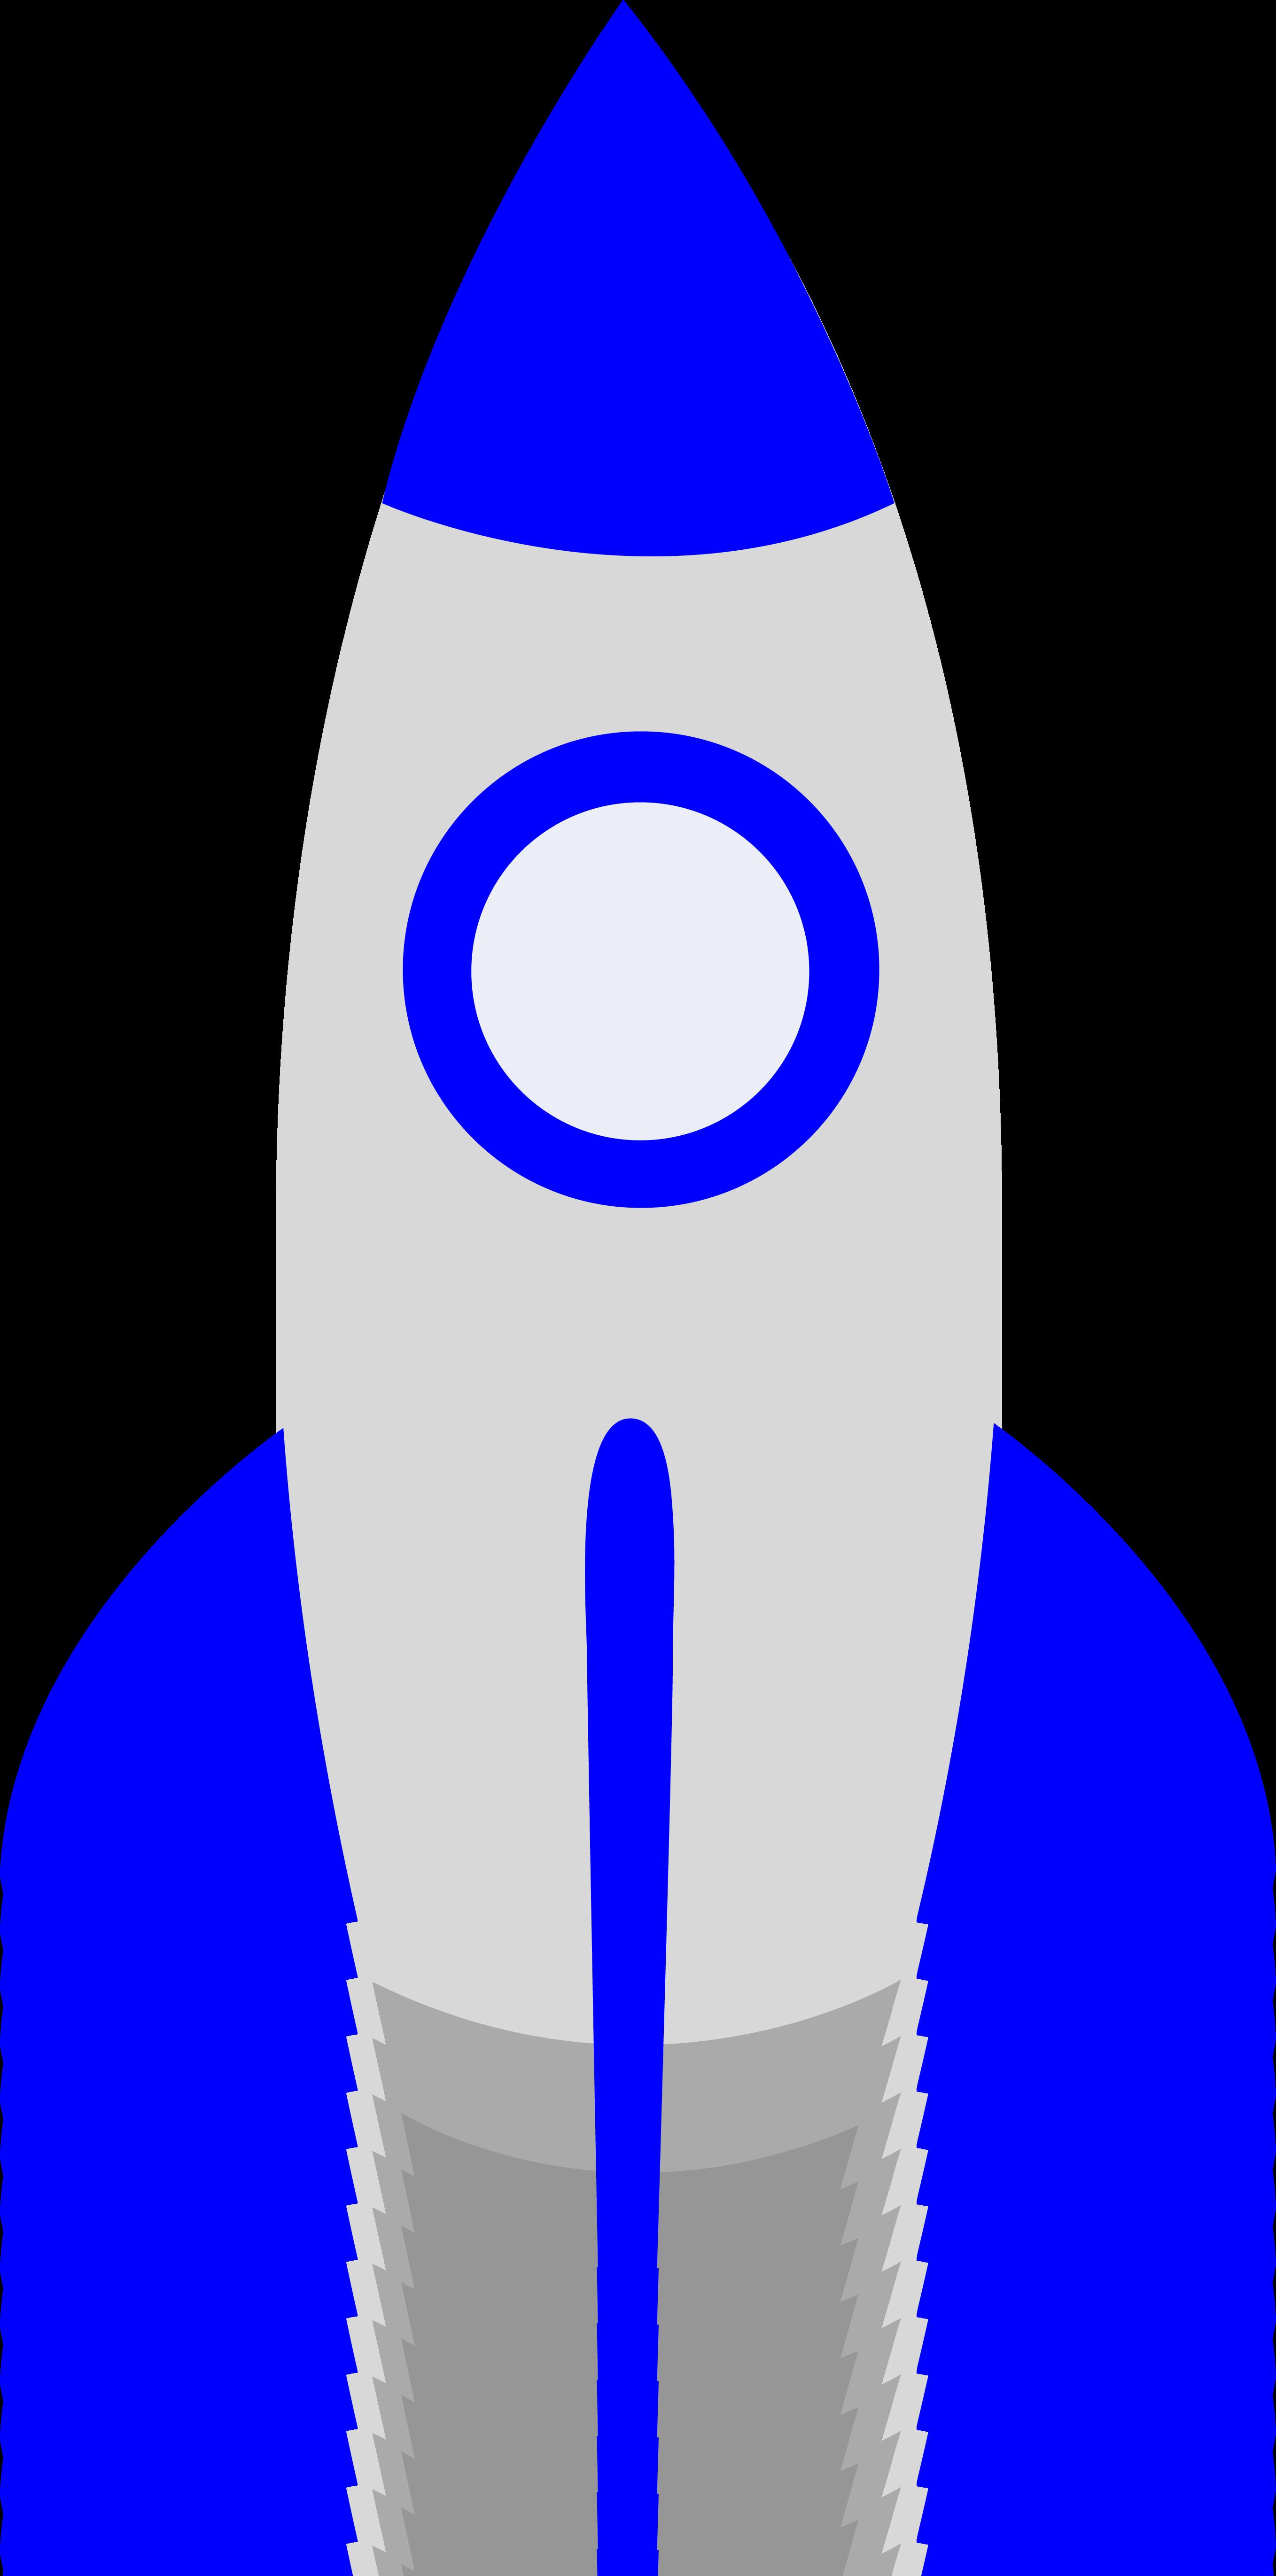 rocket shaped clipart